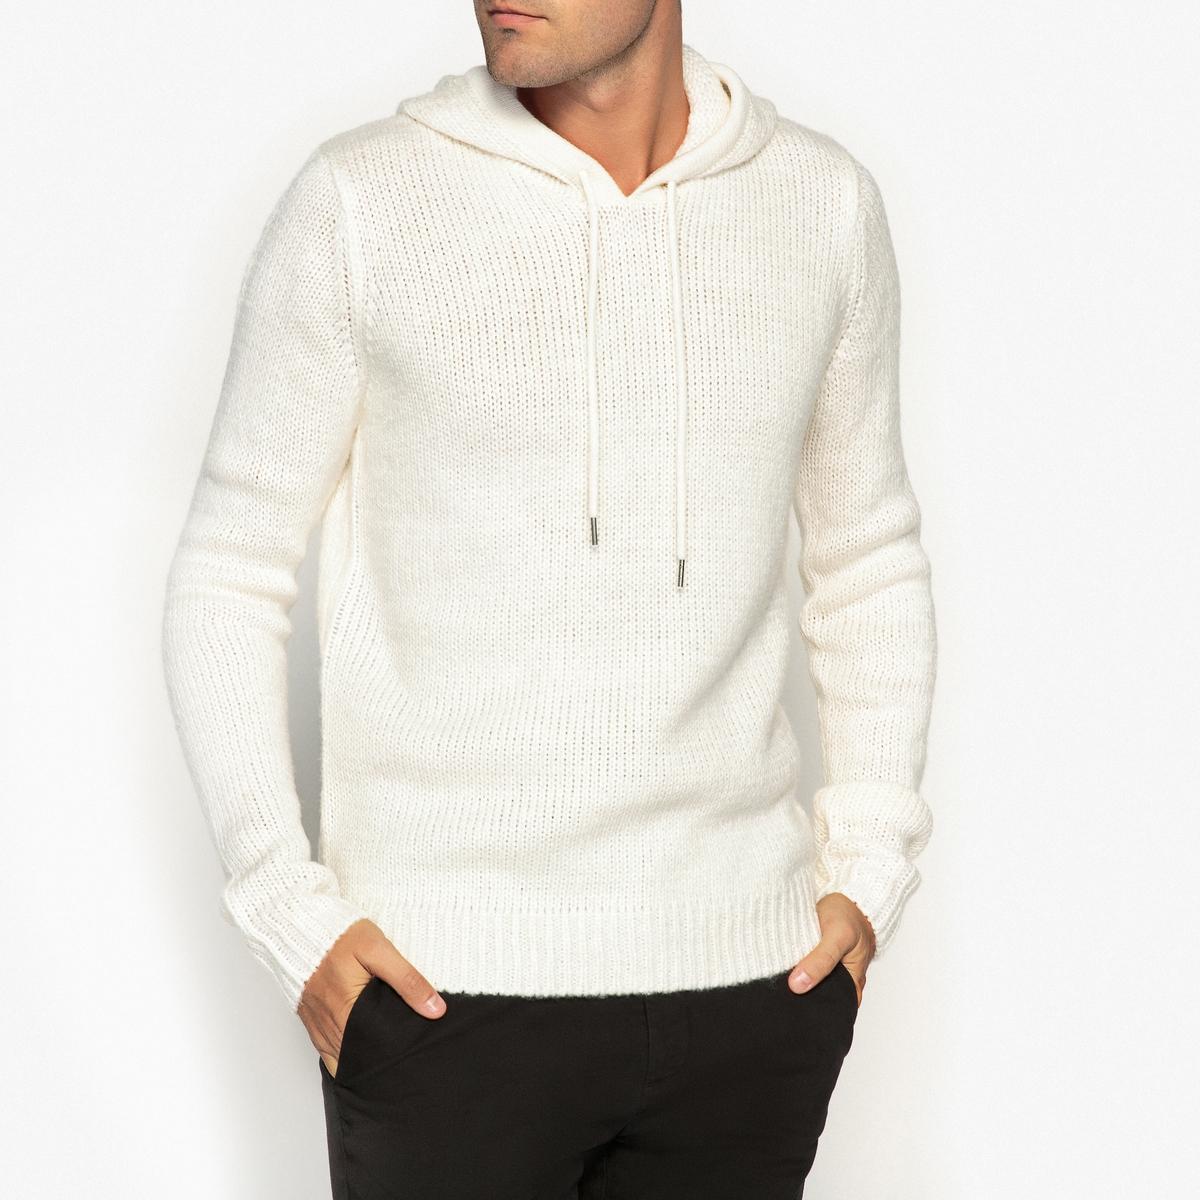 Пуловер с капюшоном из плотного трикотажа пуловер из плотного трикотажа cameron